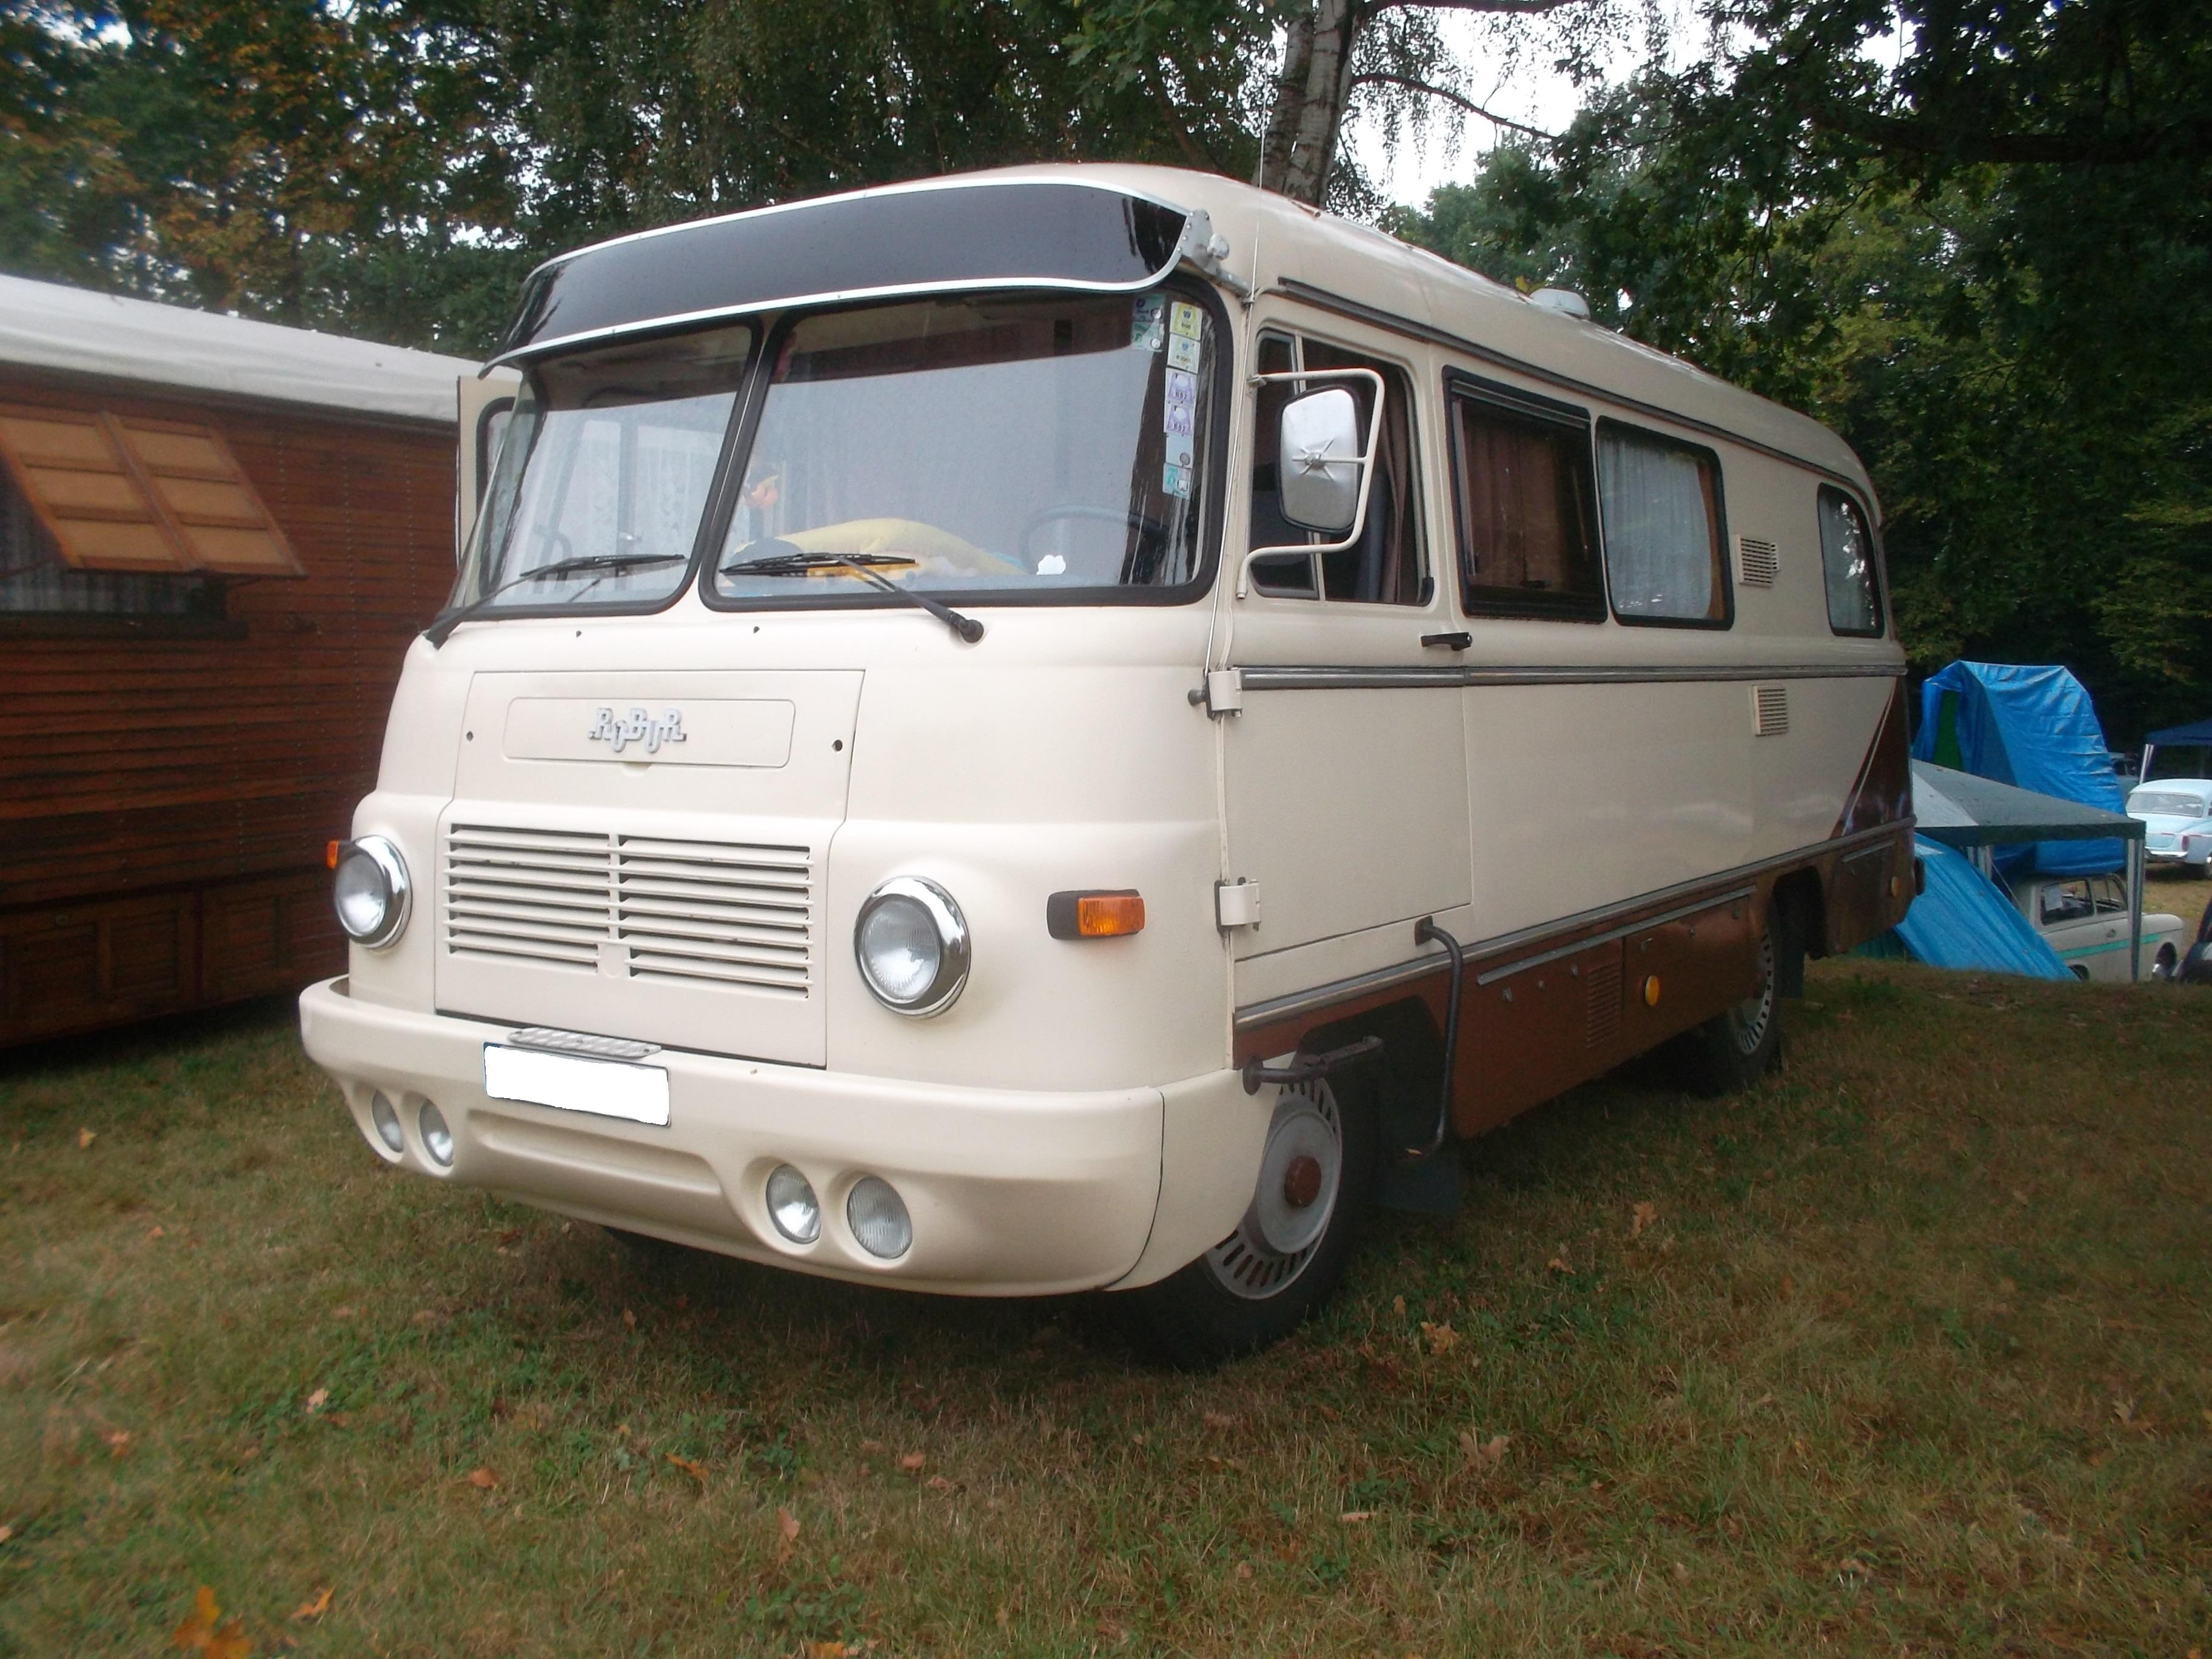 File:Robur LO 10 B 10 Wohnmobilbus (side).jpg - Wikimedia Commons